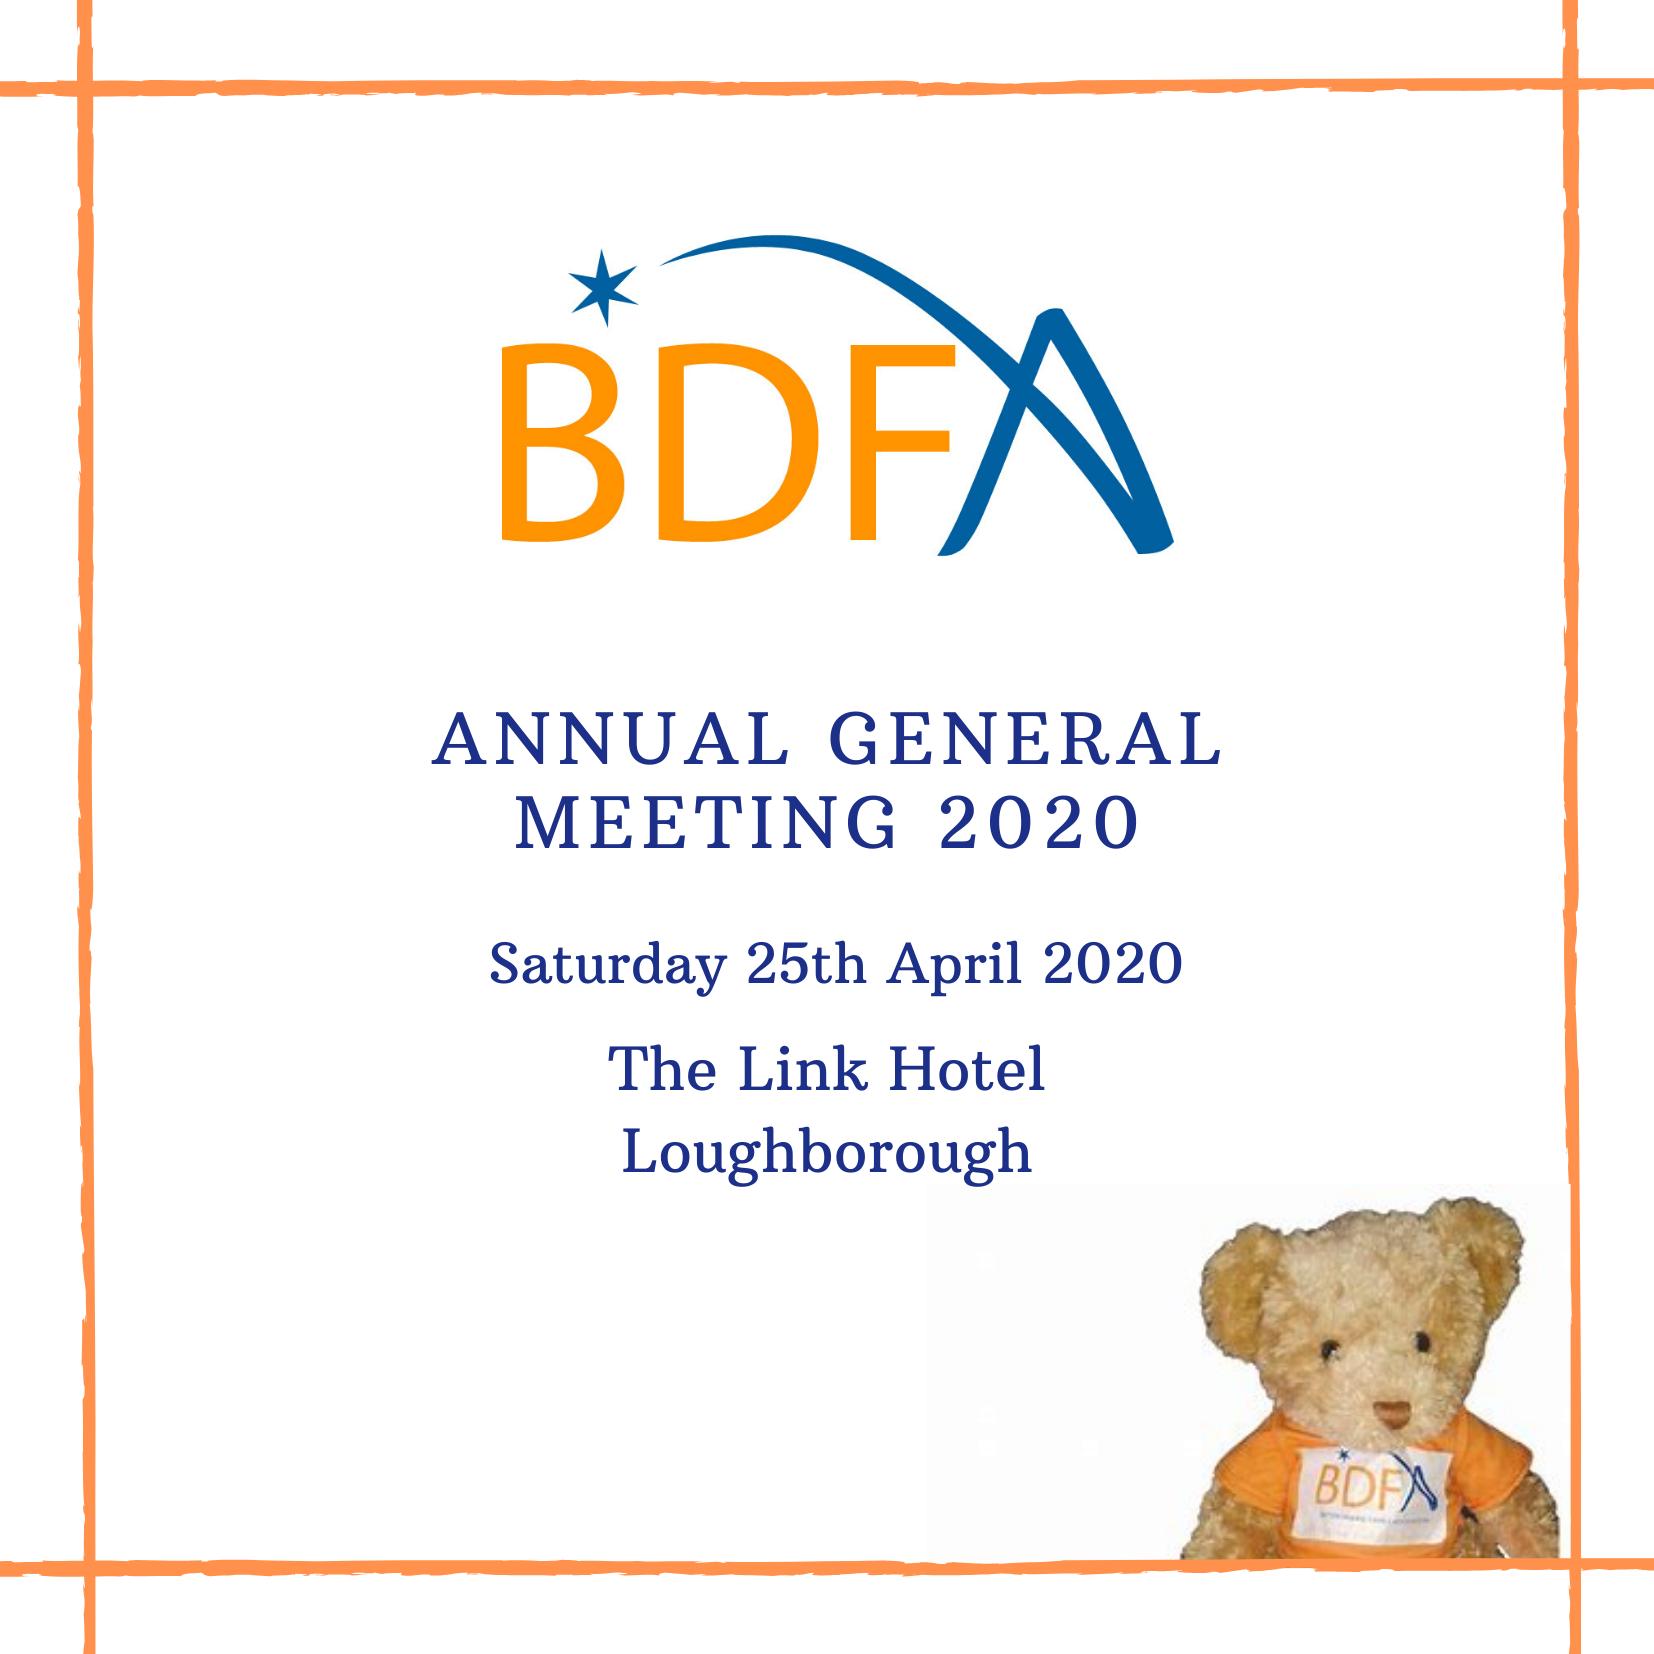 BDFA AGM News!